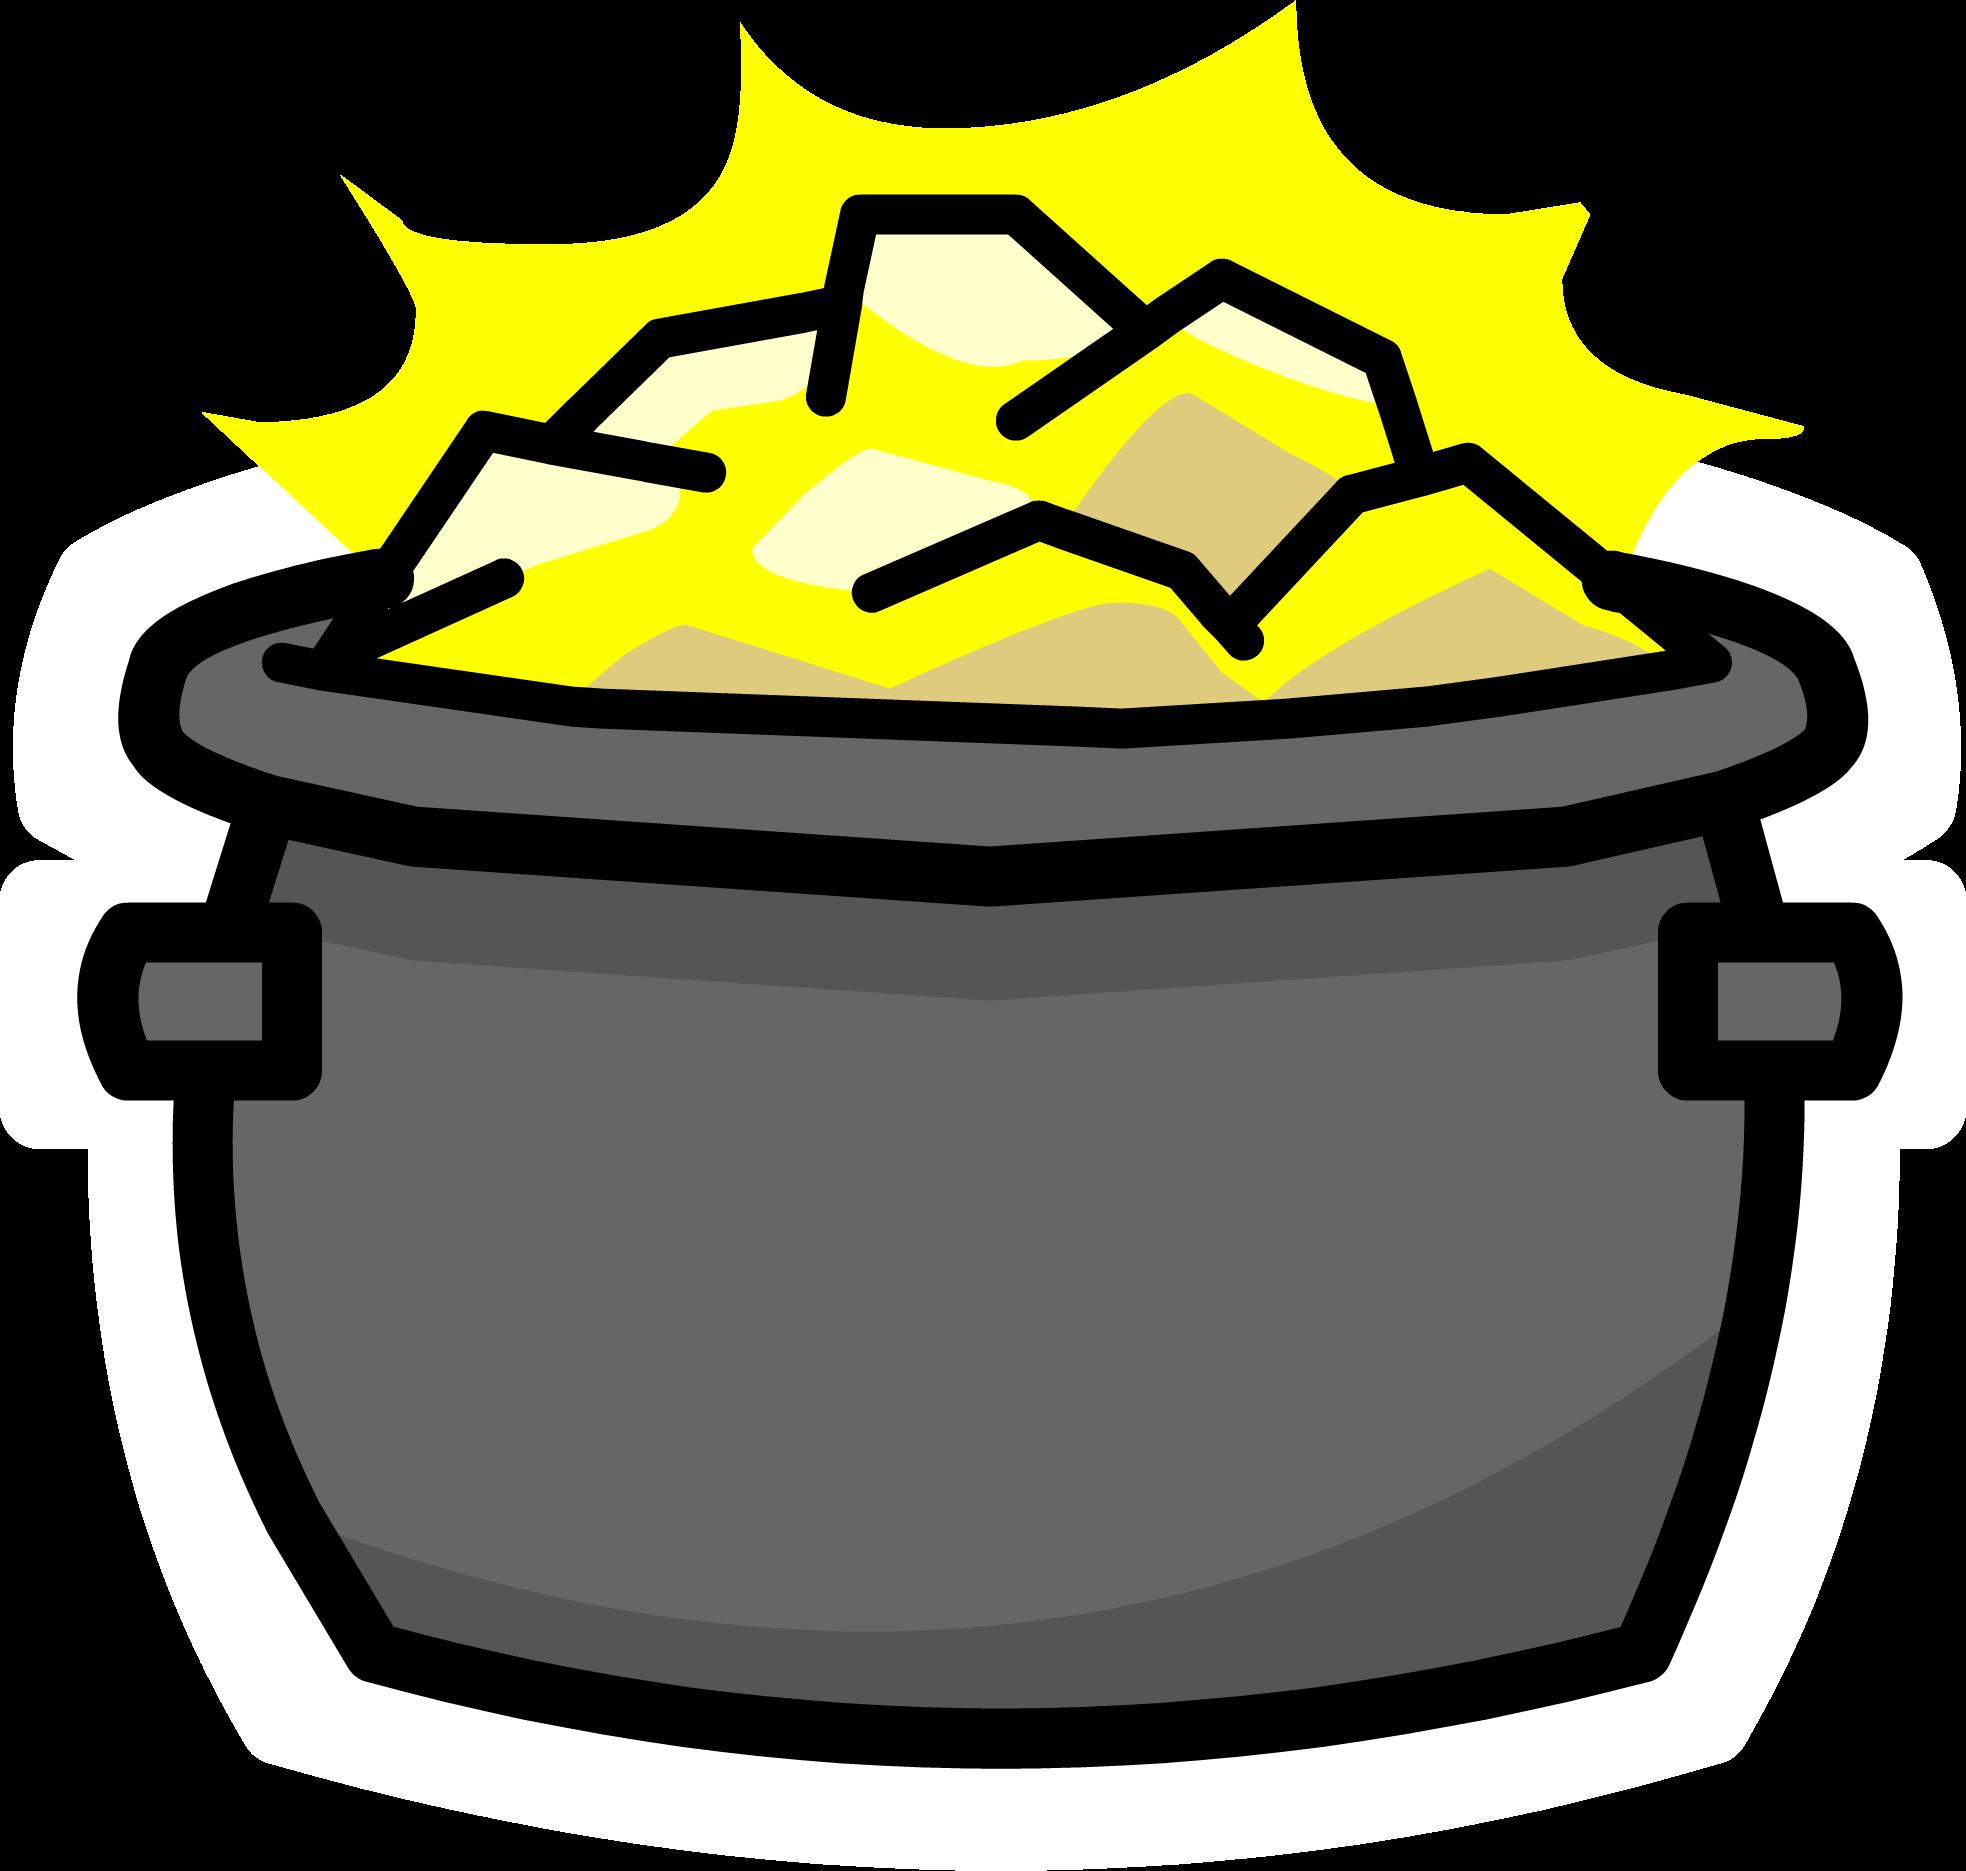 Pot O Gold pin Club Penguin Wiki FANDOM powered by Wikia